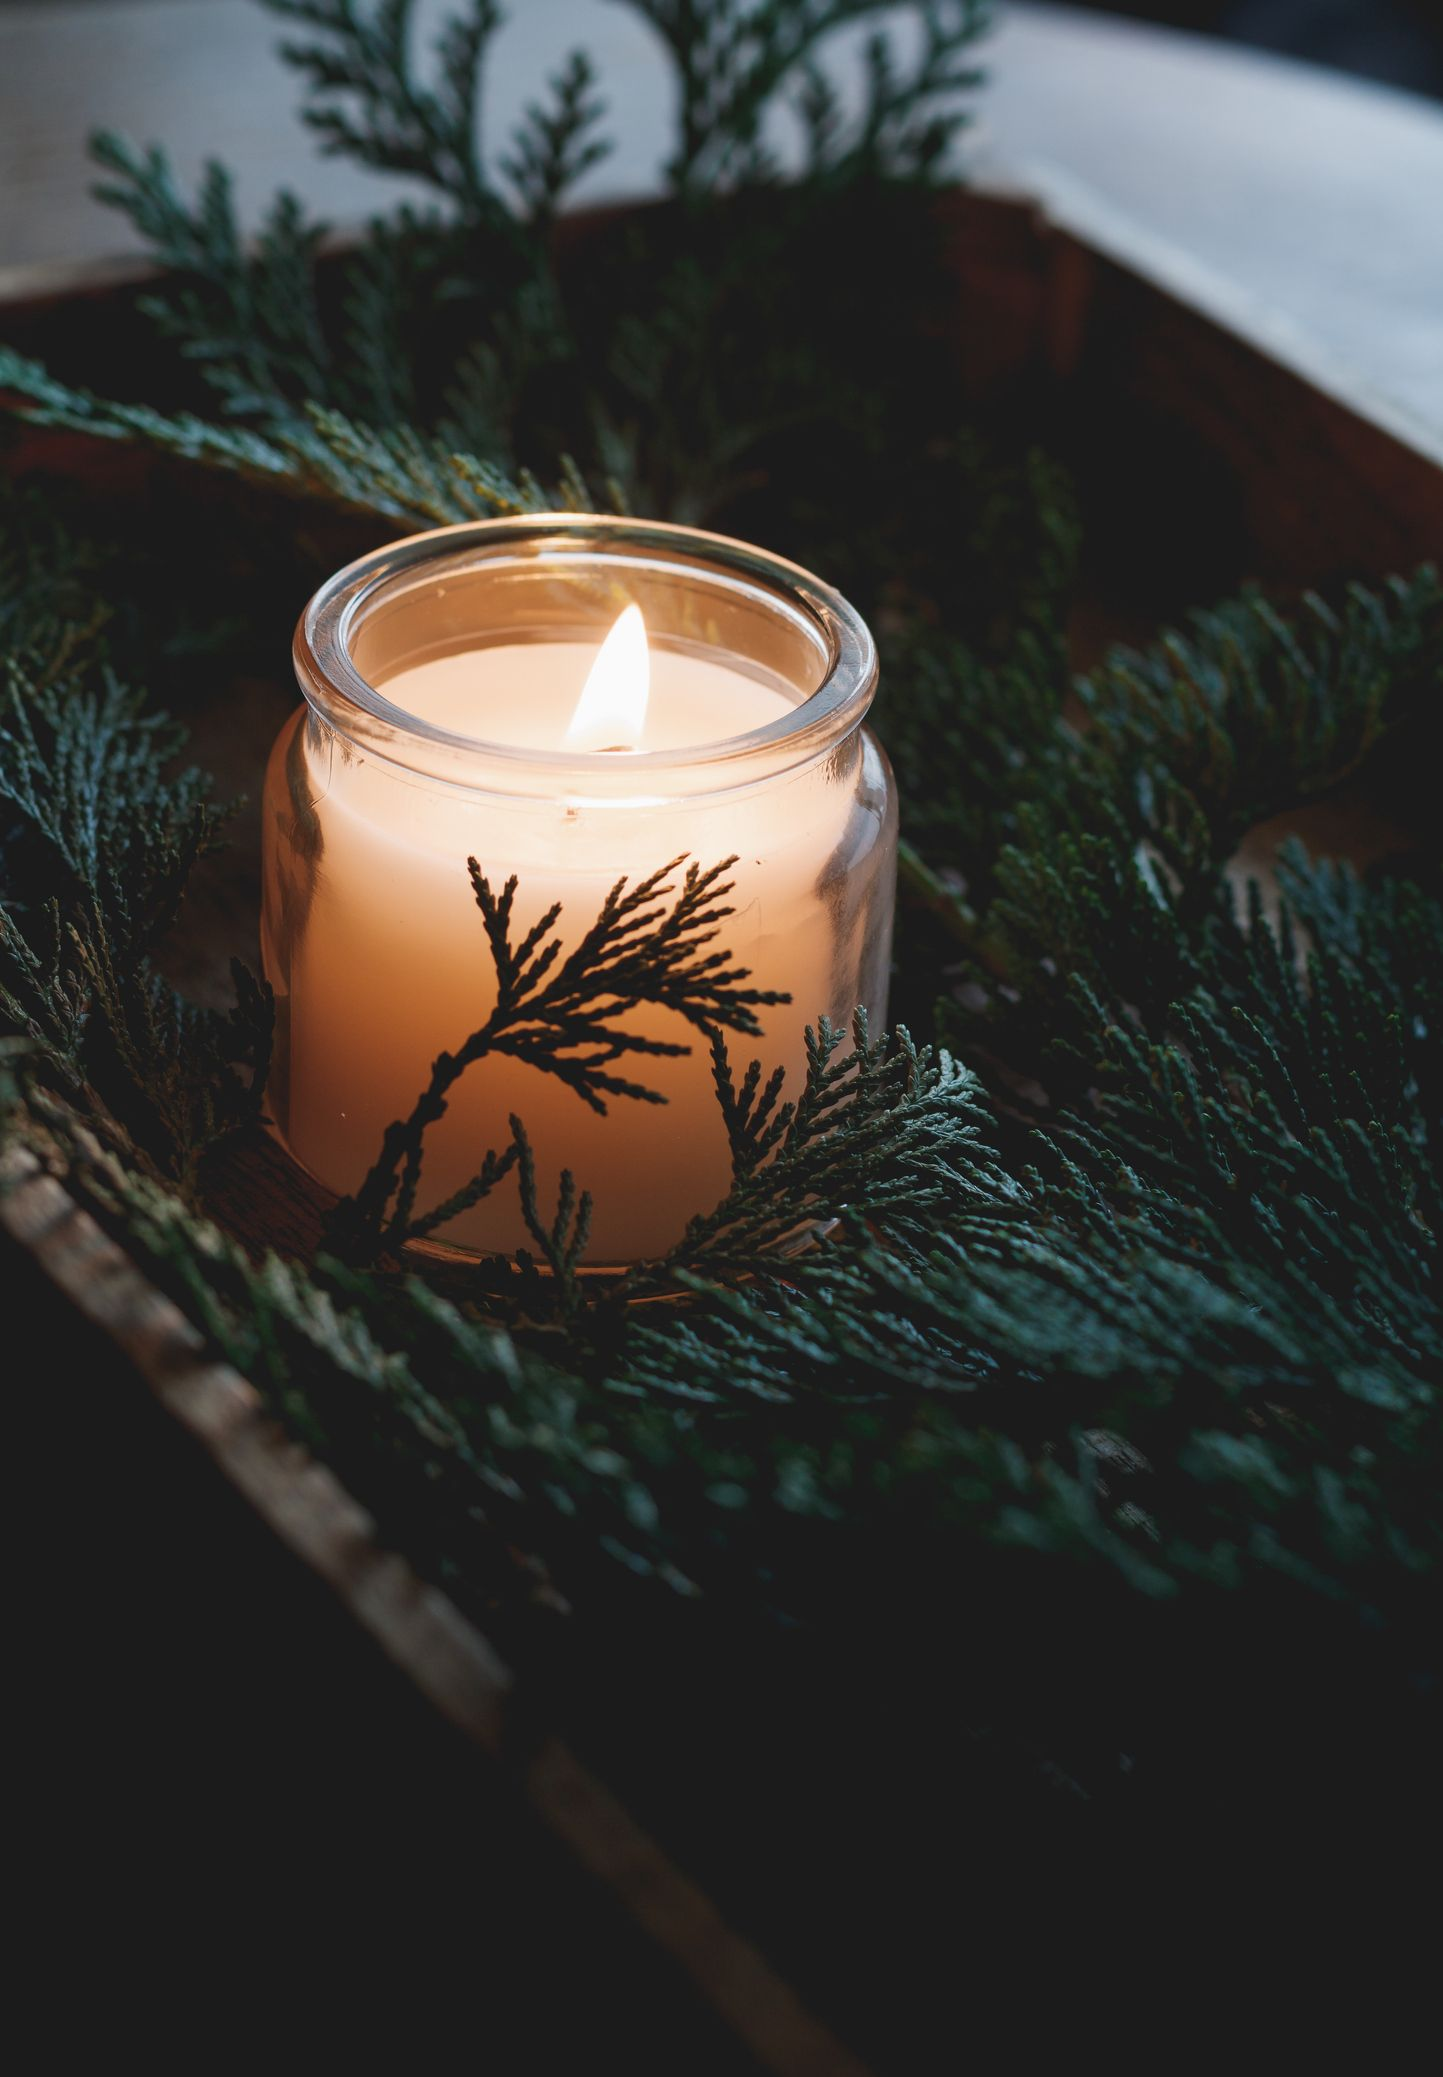 Di candele profumate, serate autunnali e solitudini cocoon